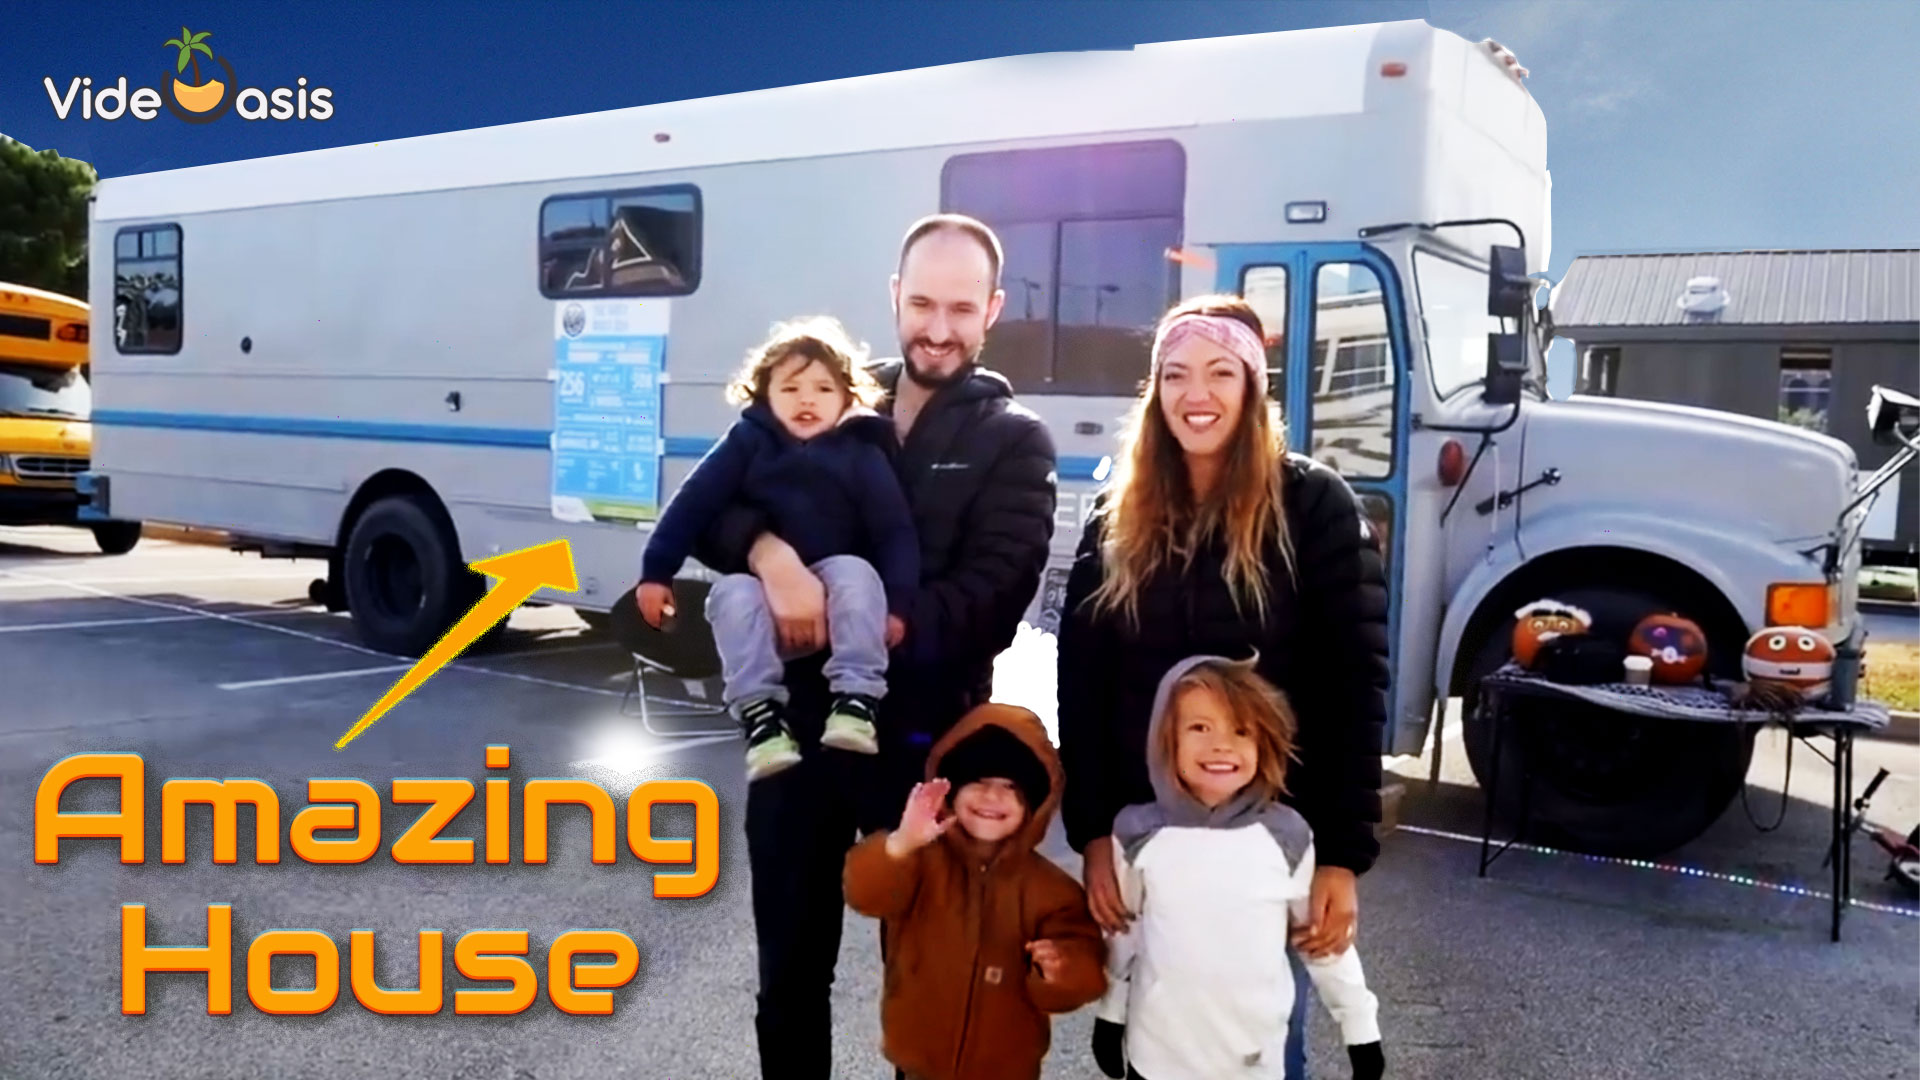 VideOasis Amazing- Amazing House |VideOasis